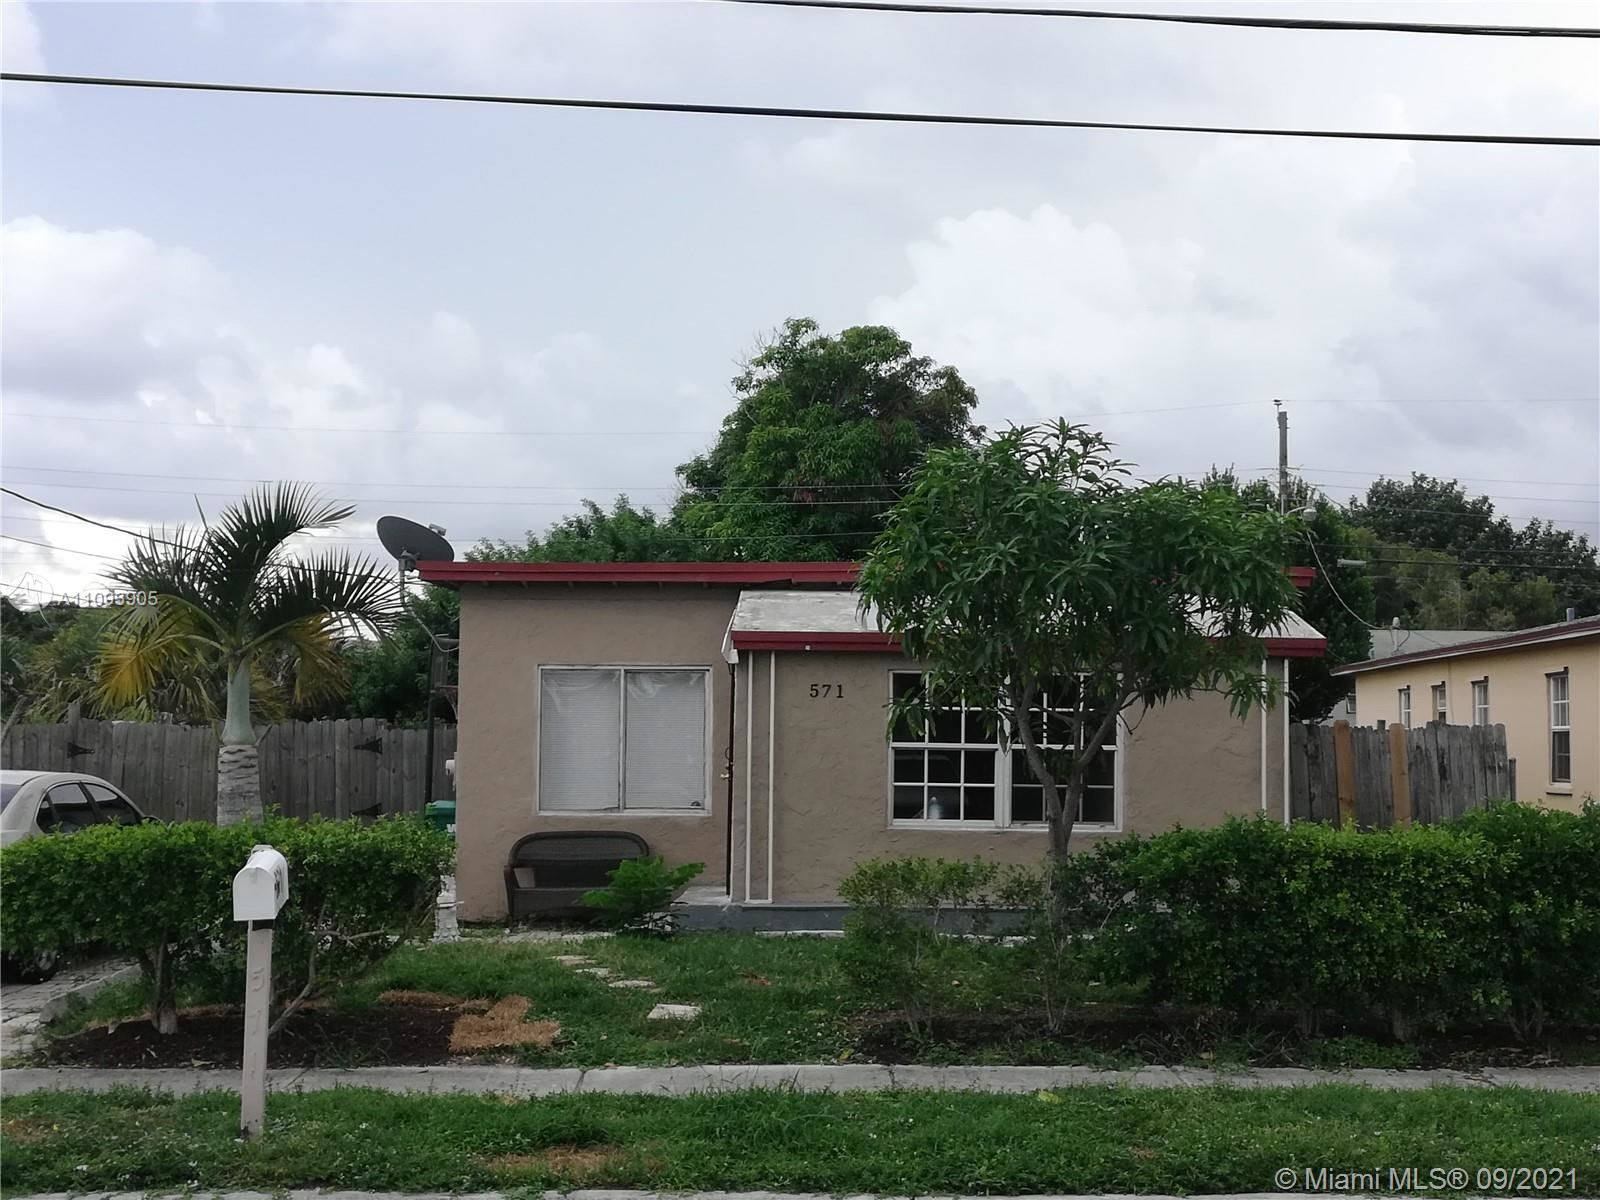 571 W 6th St, Riviera Beach, FL 33404 - #: A11093905